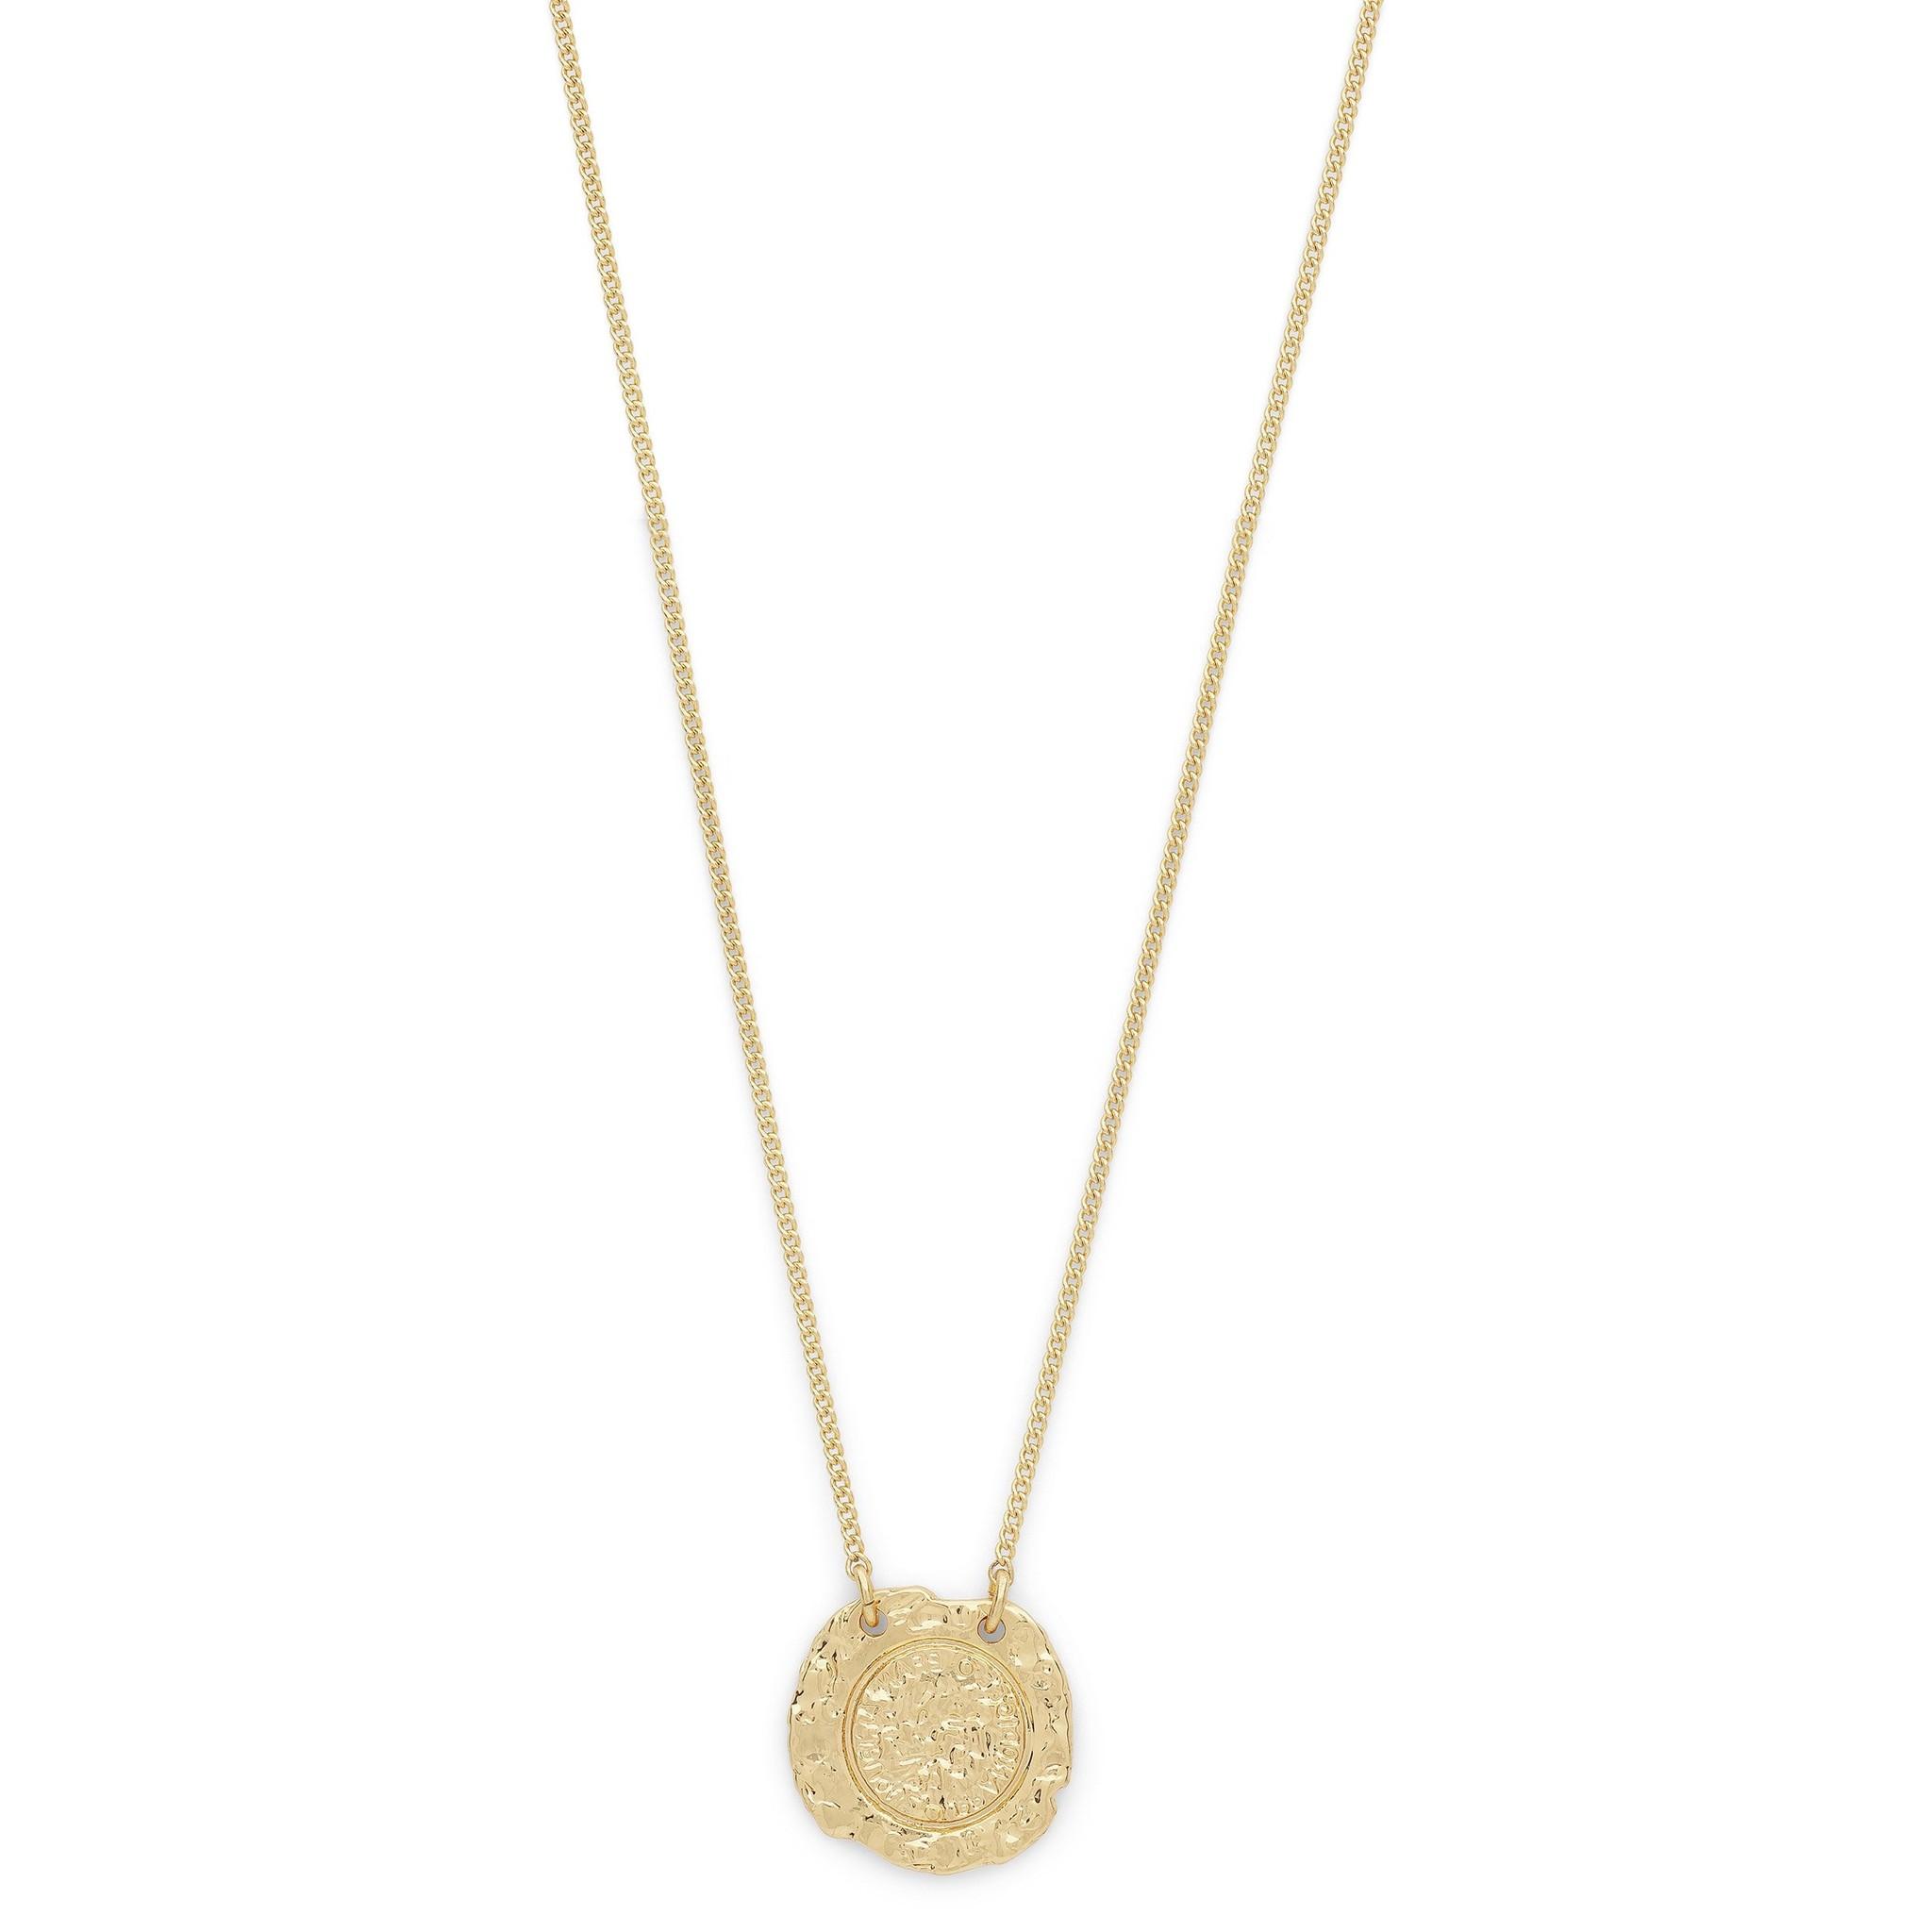 Pilgrim Pilgrim Marley Gold Coin Necklace